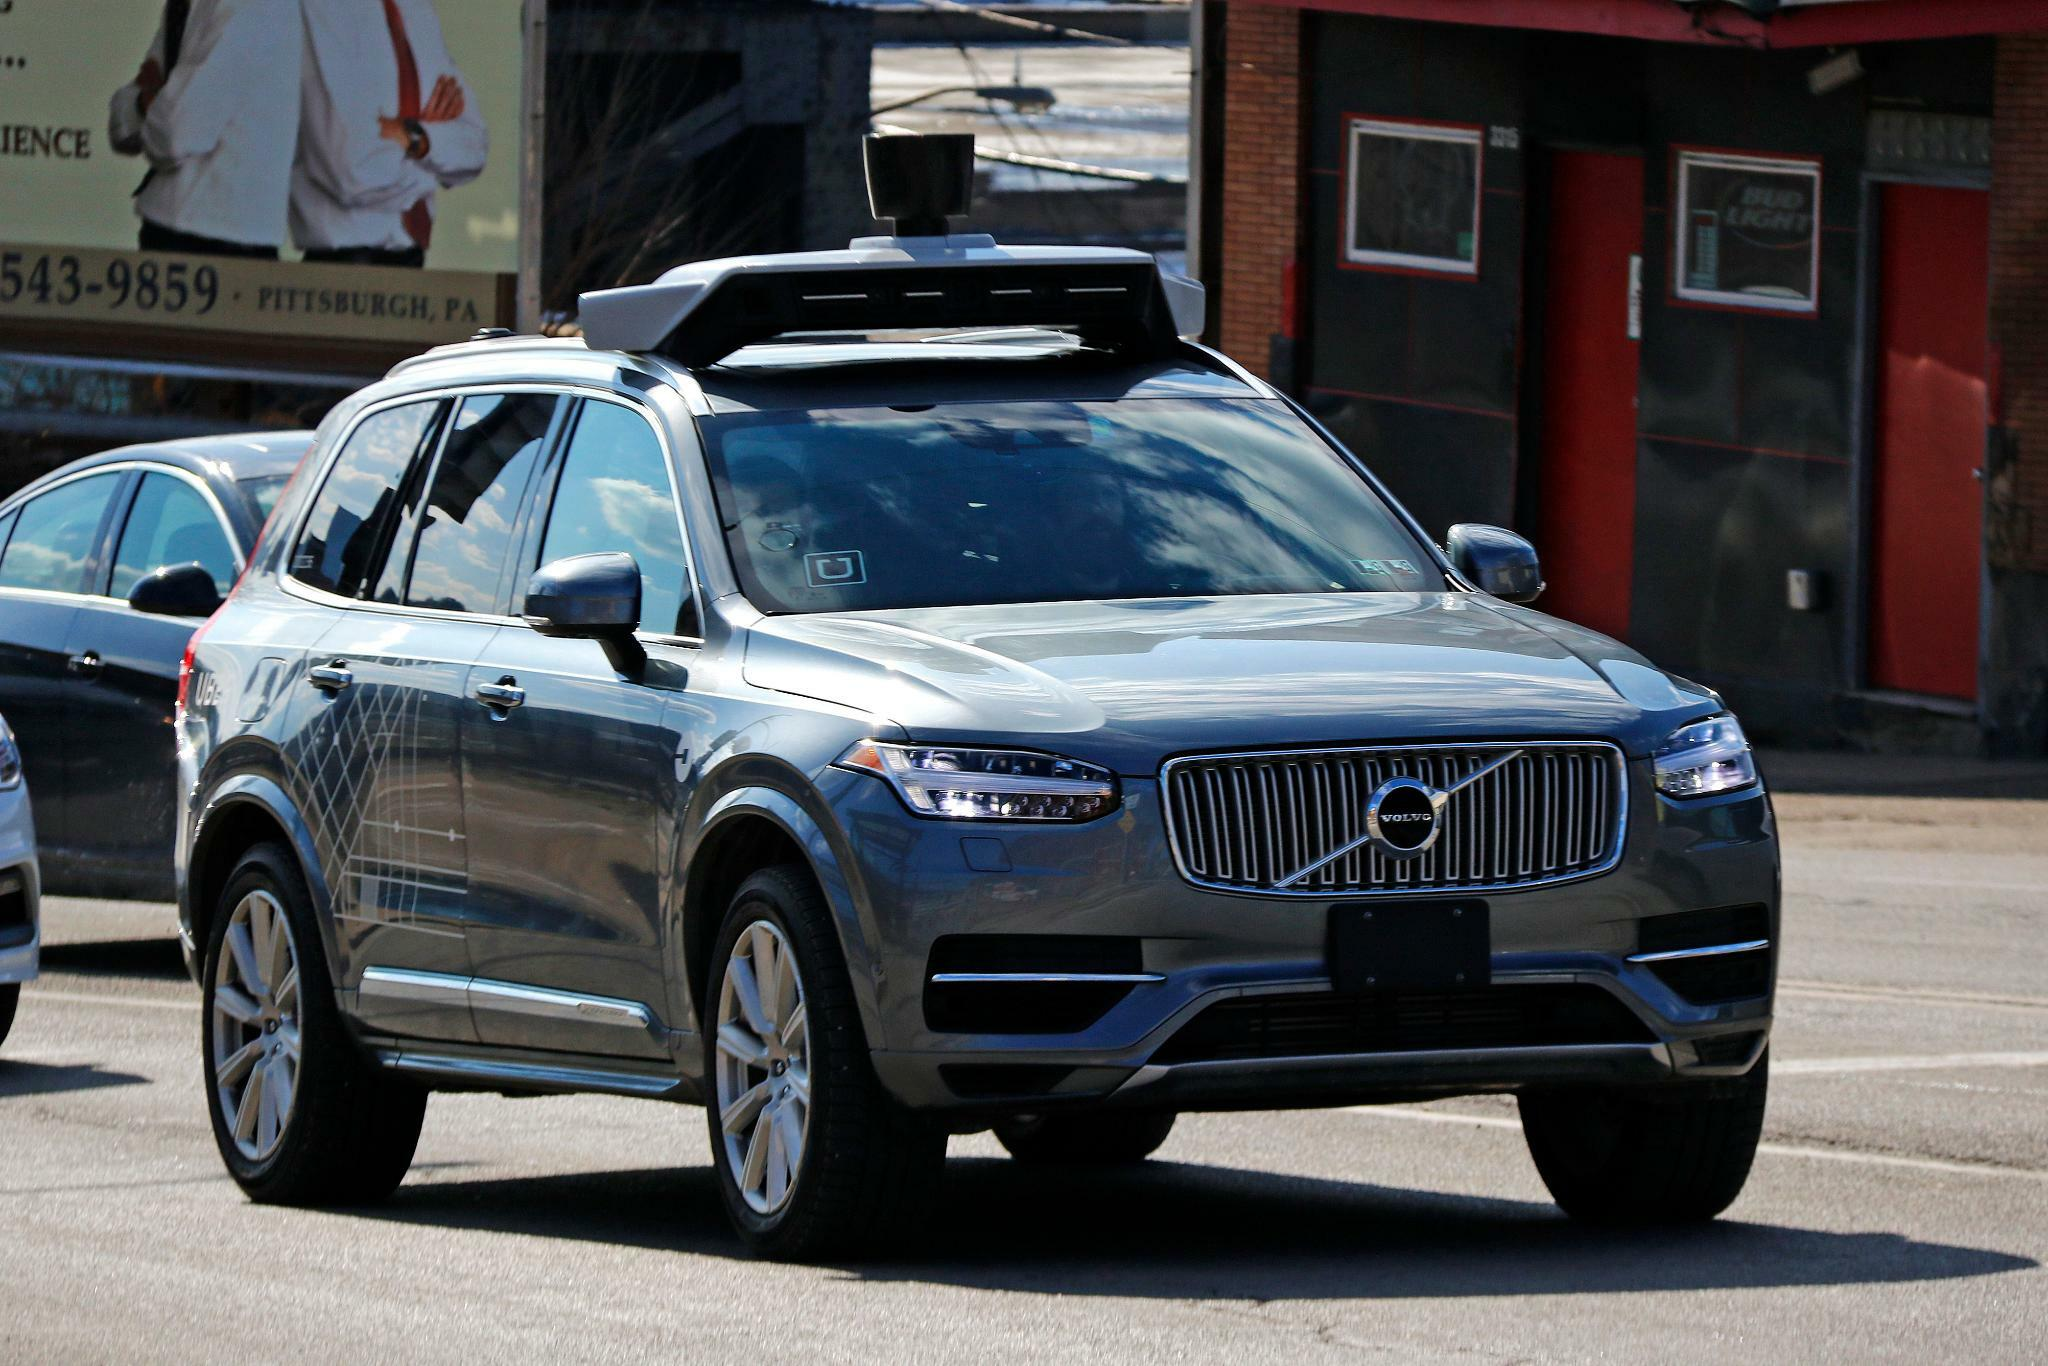 Tödlicher Uber-Crash: Robo-Autos sollen stärker reguliert werden